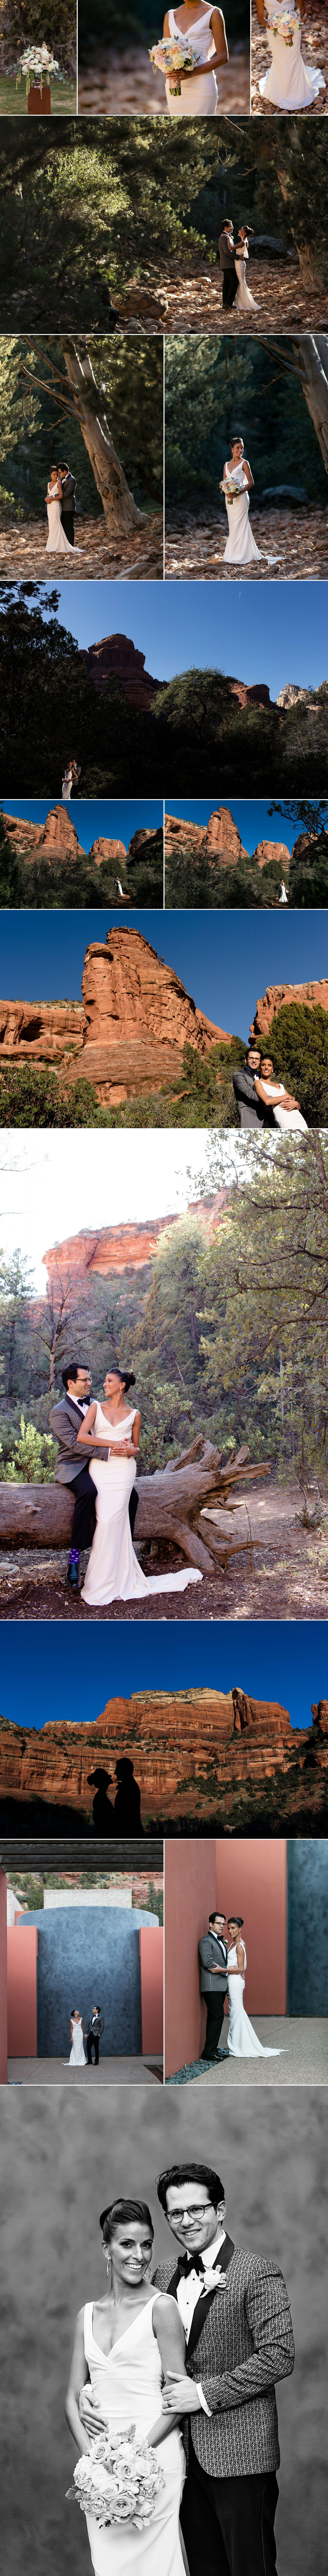 Couple's photographs at the Enchantment Resort in Sedona Arizona